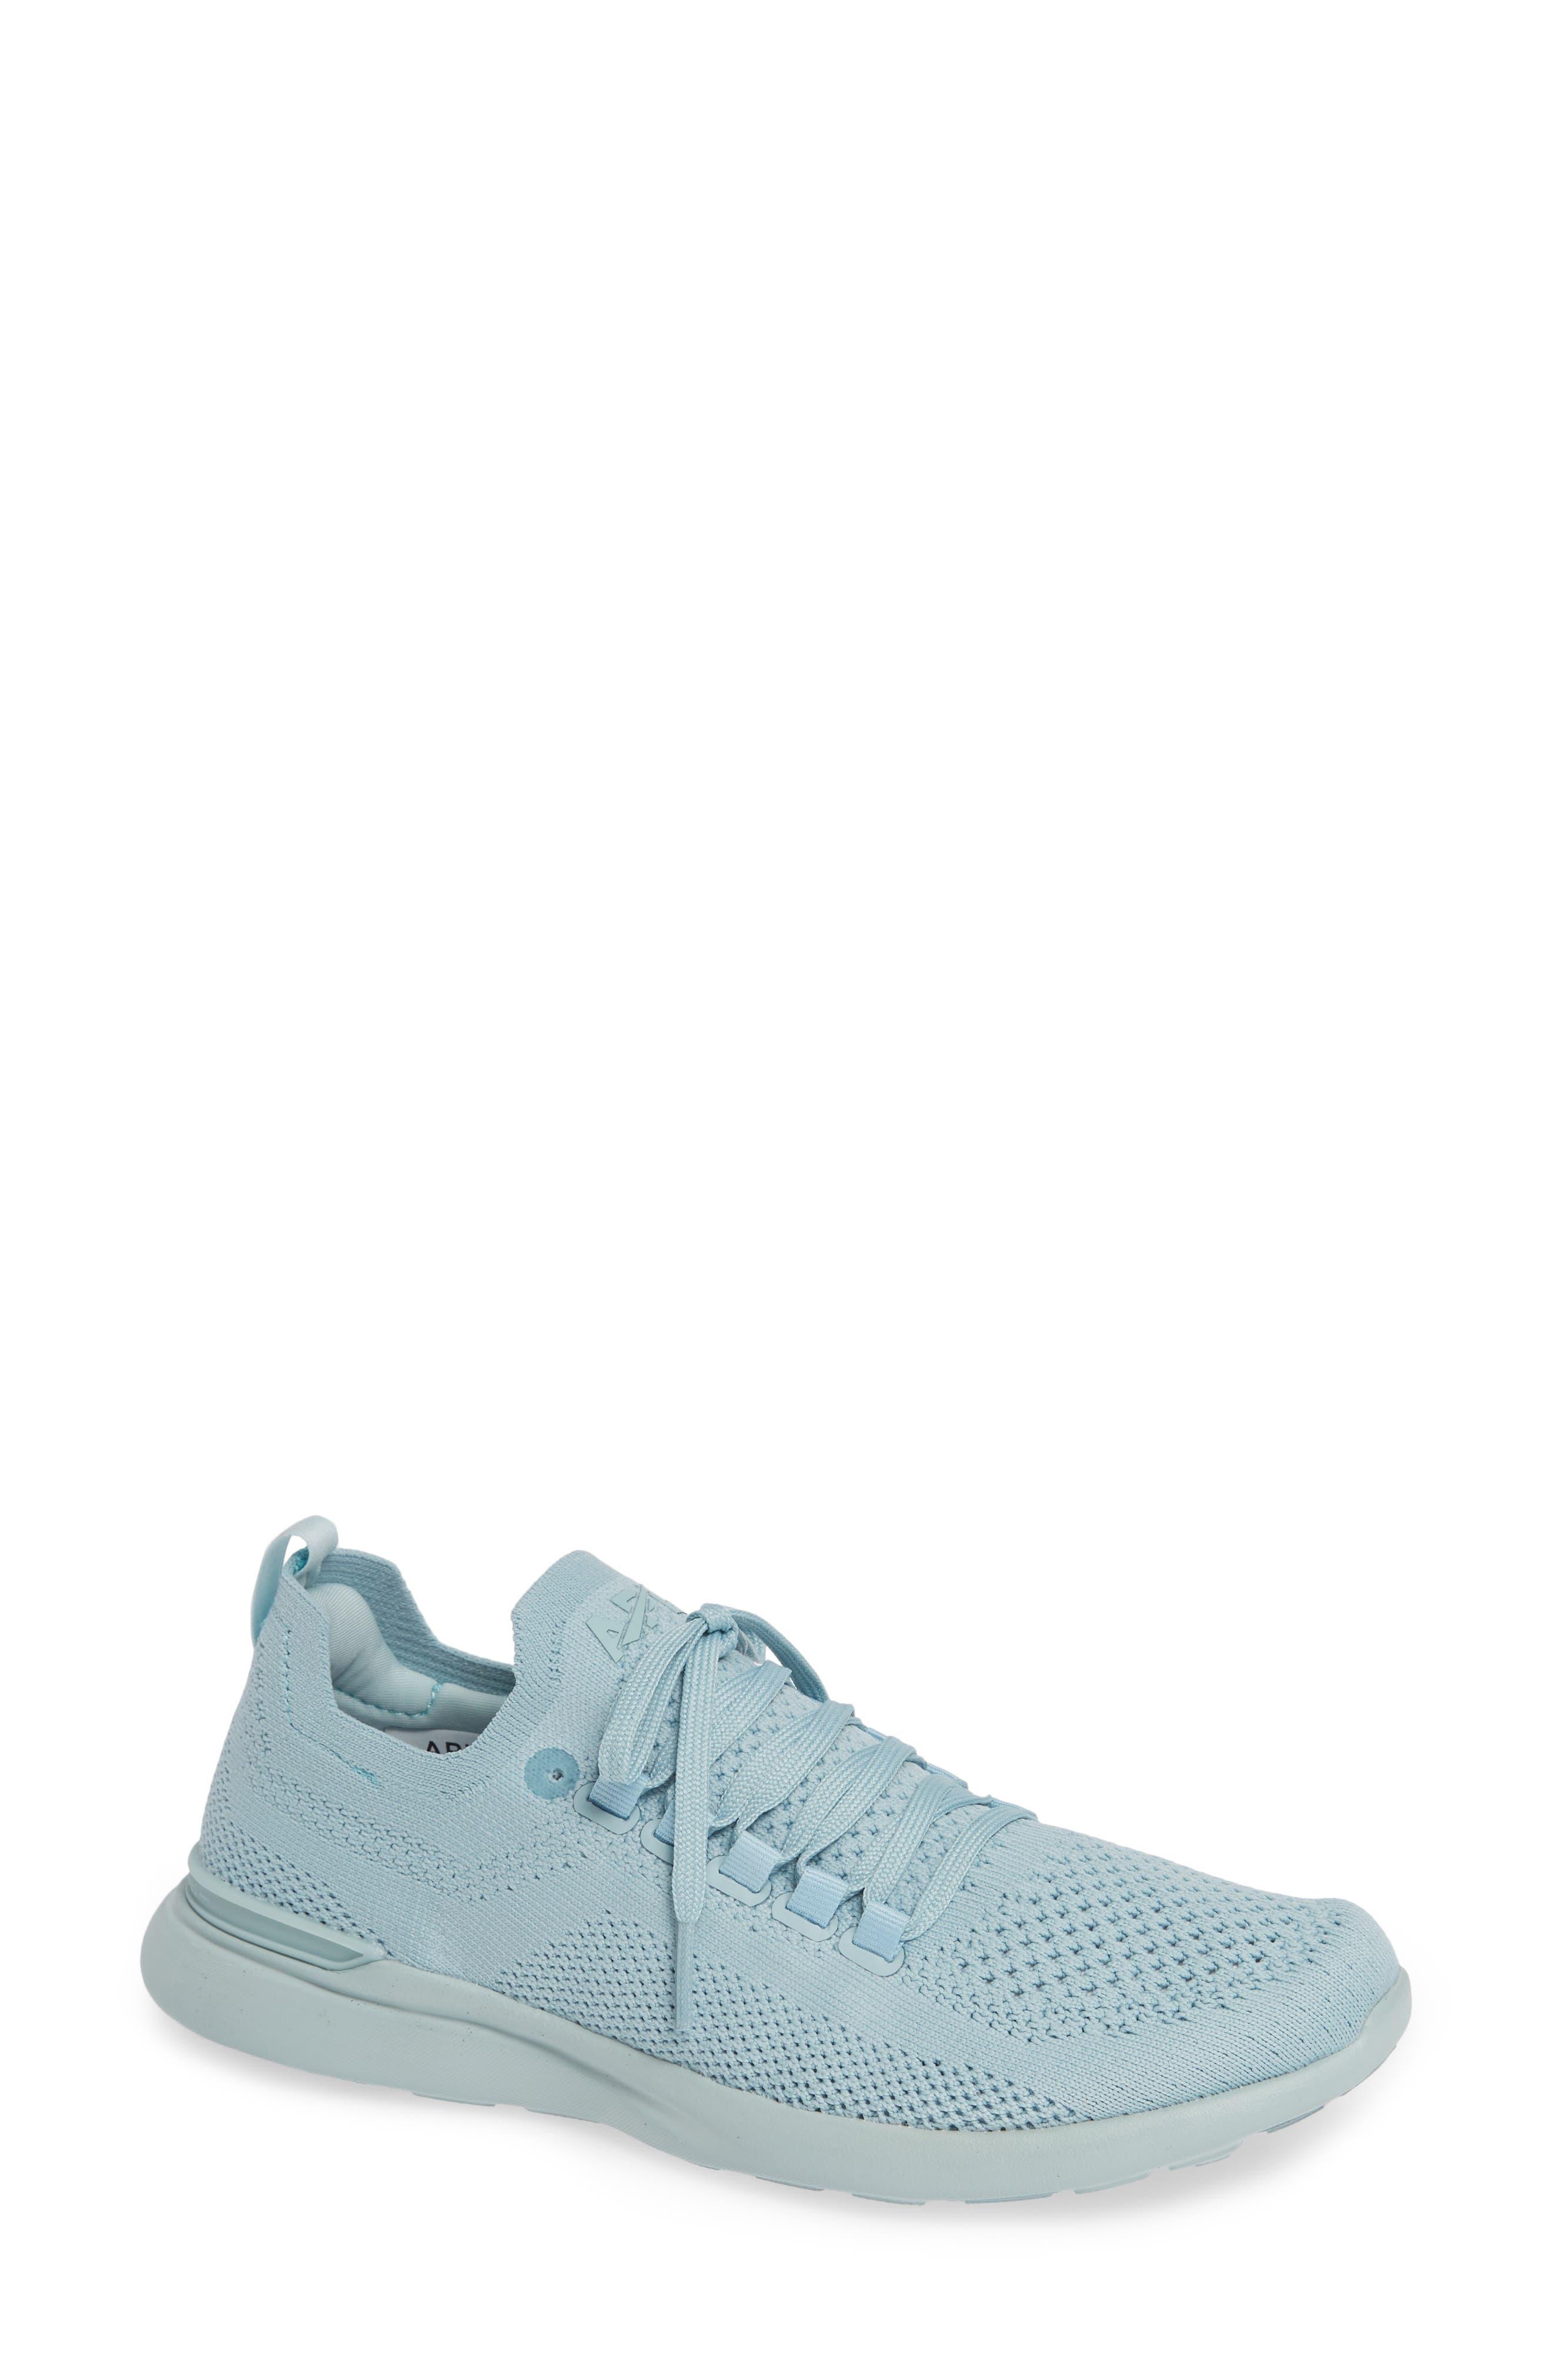 APL | TechLoom Breeze Knit Running Shoe